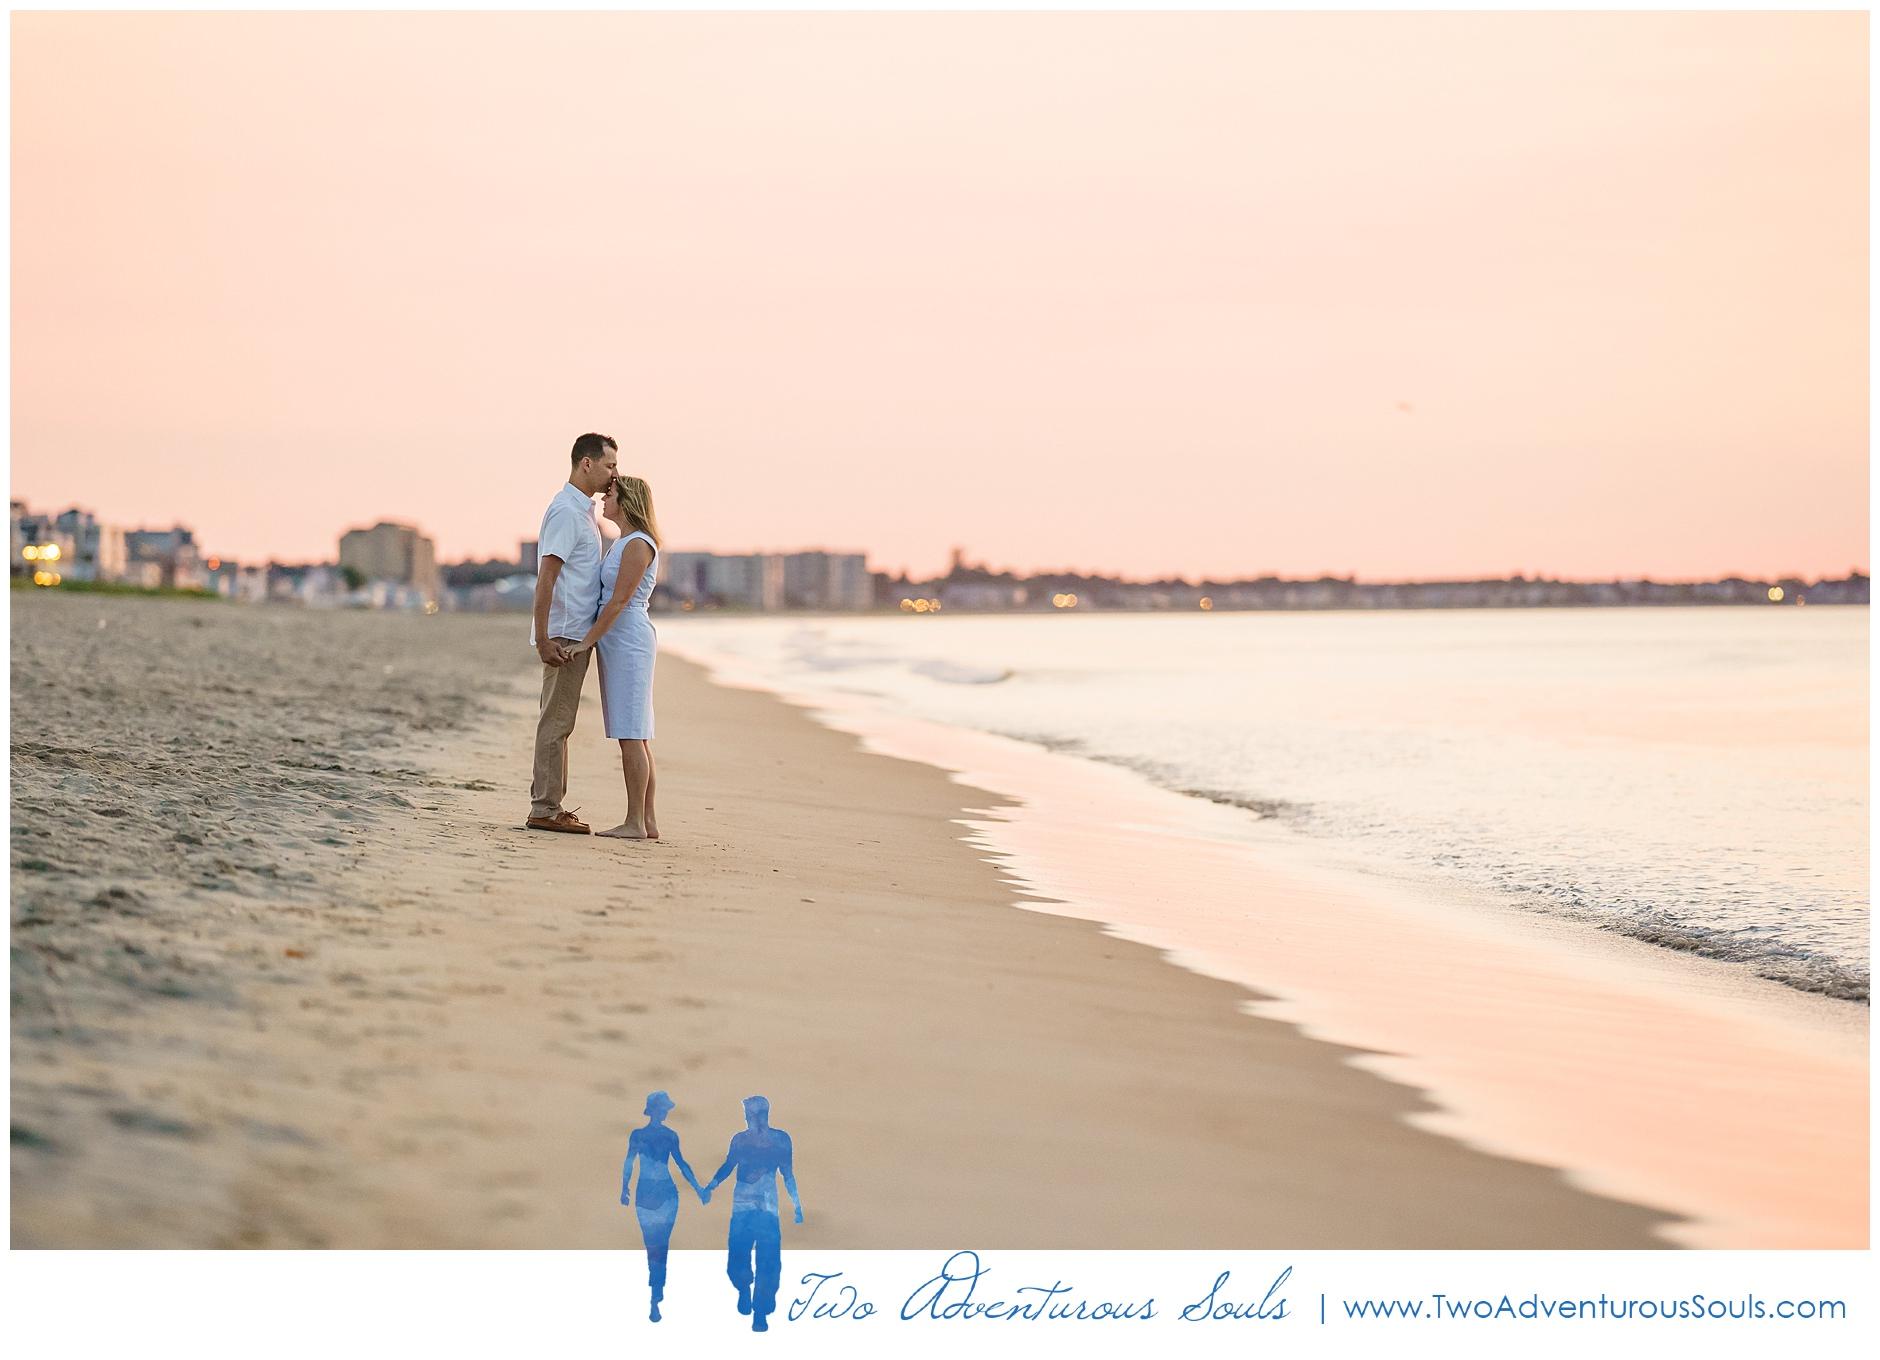 Maine Wedding Photographers, Connecticut Wedding Photographers, Old Orchard Beach Wedding Photographers, Two Adventurous Souls-JustinElise_0002.jpg